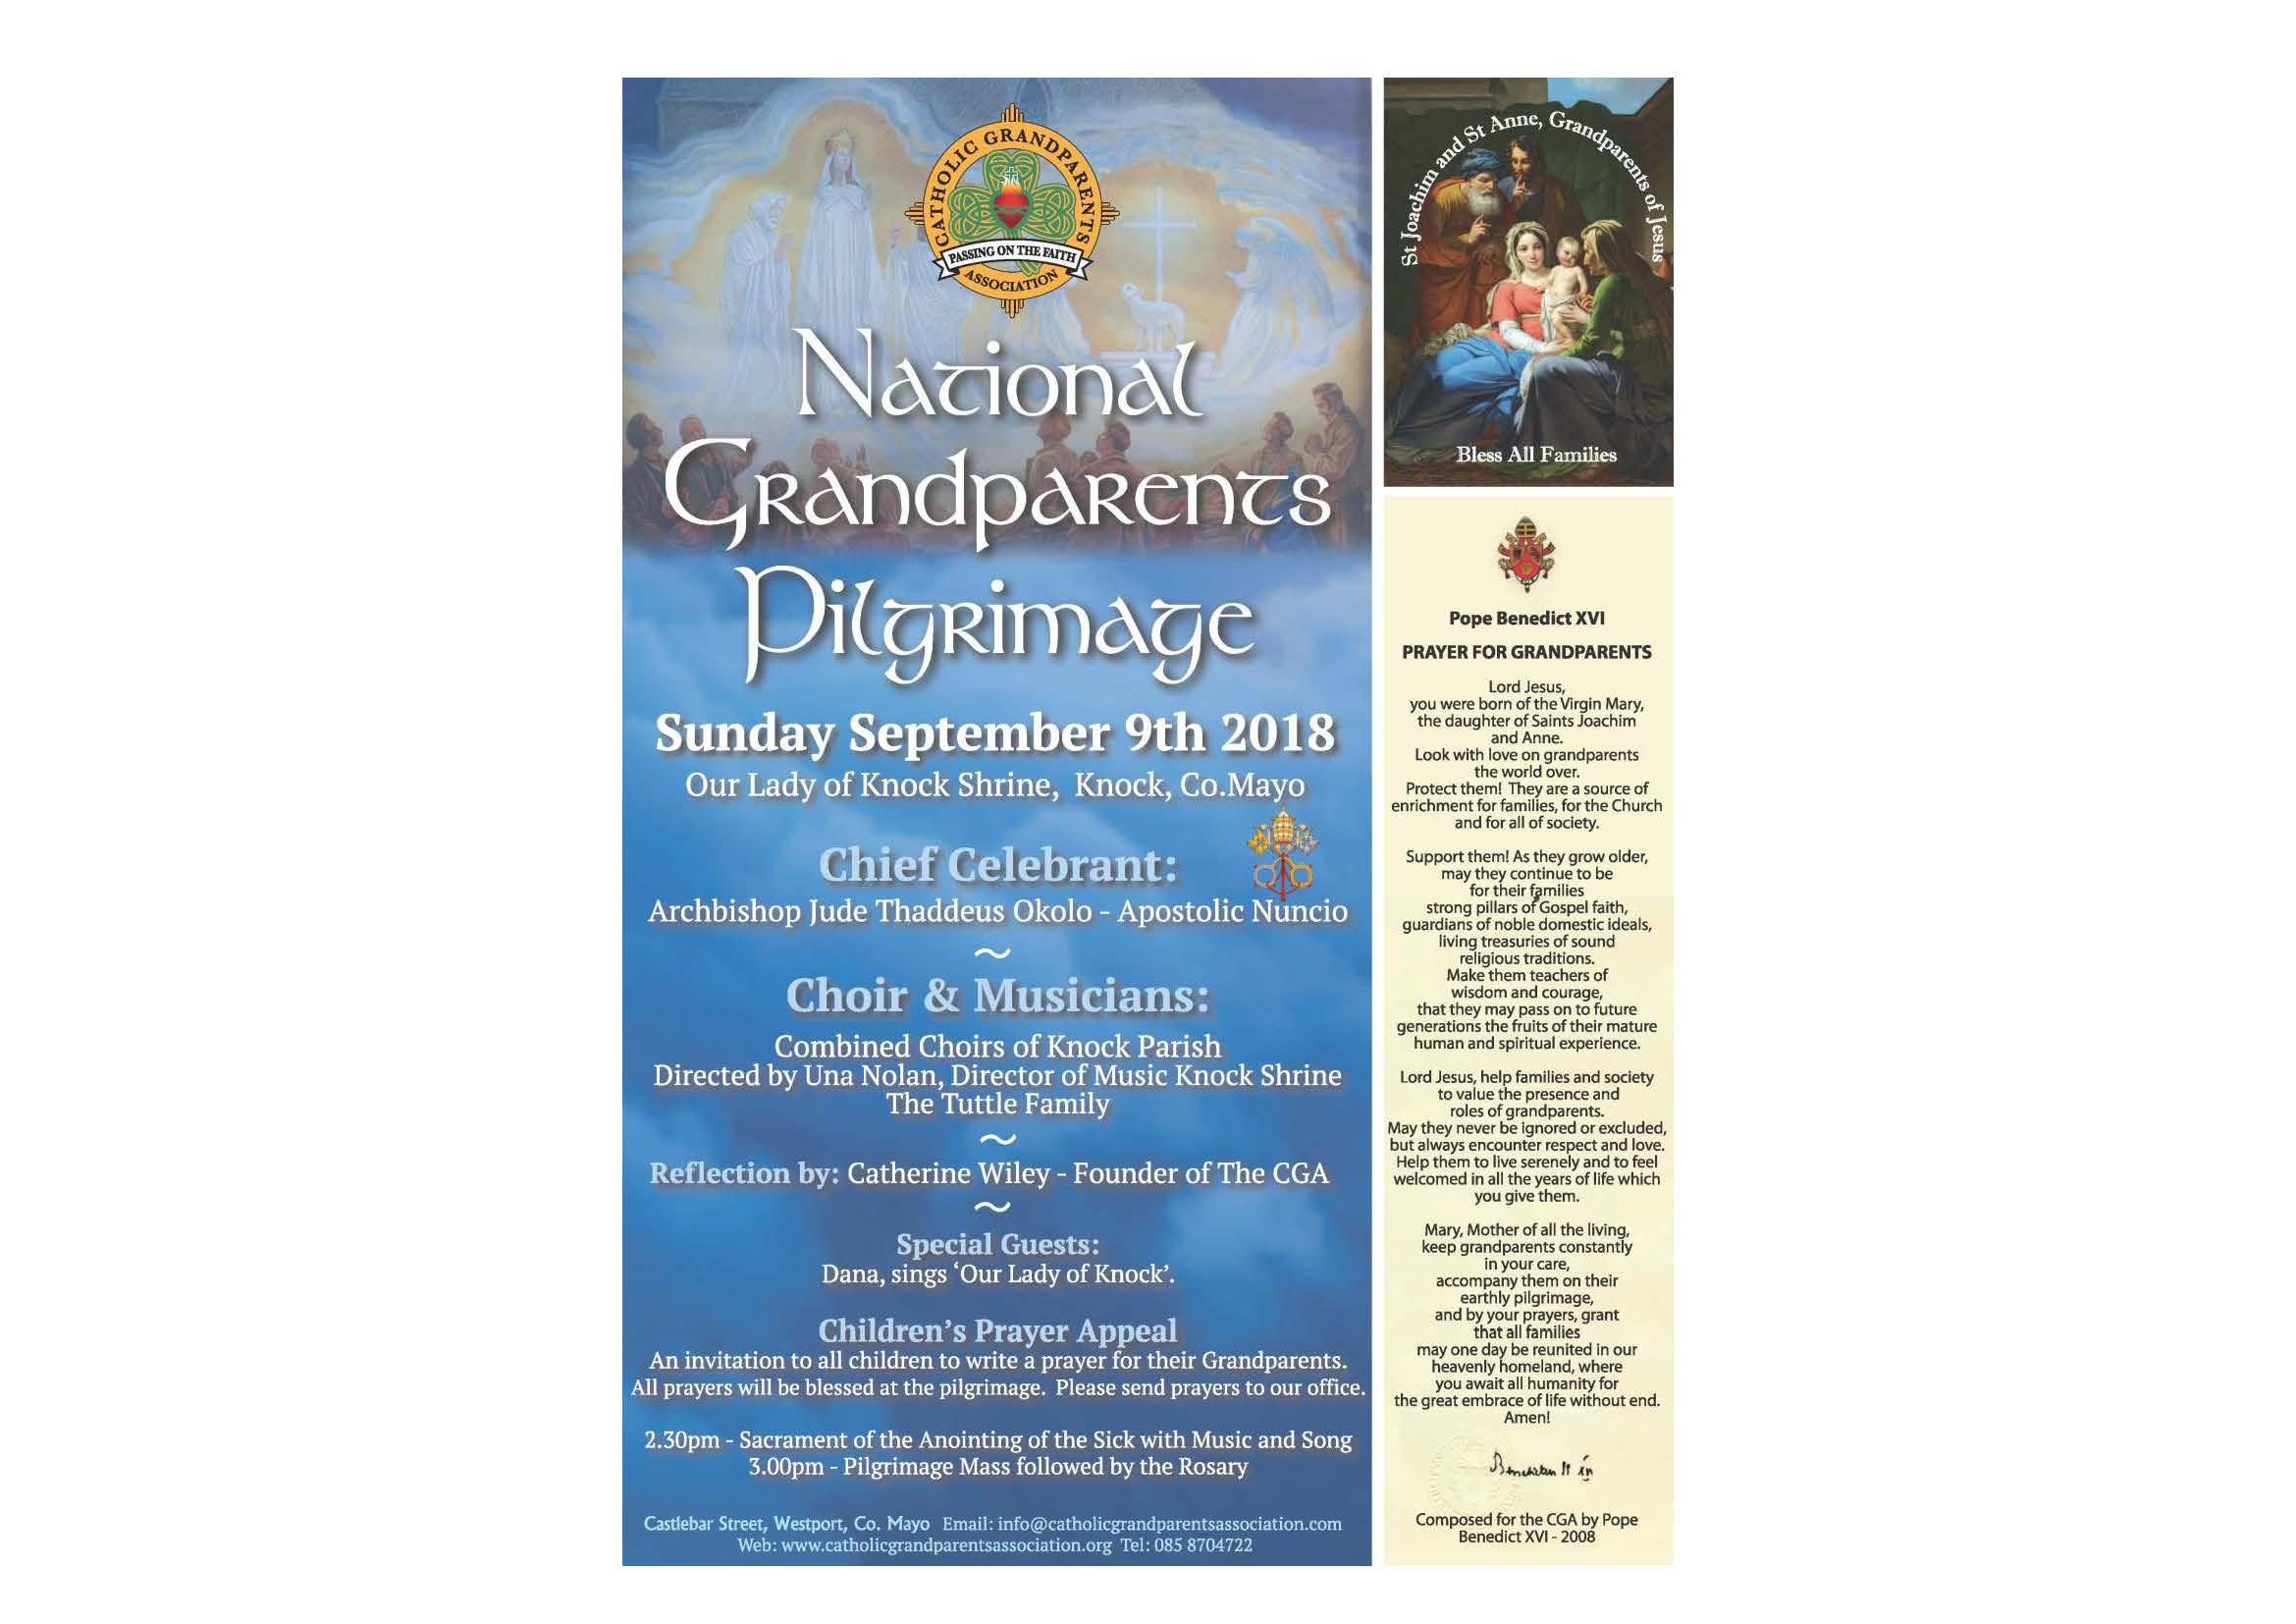 National-Grandparents-Day-2018-2.jpg